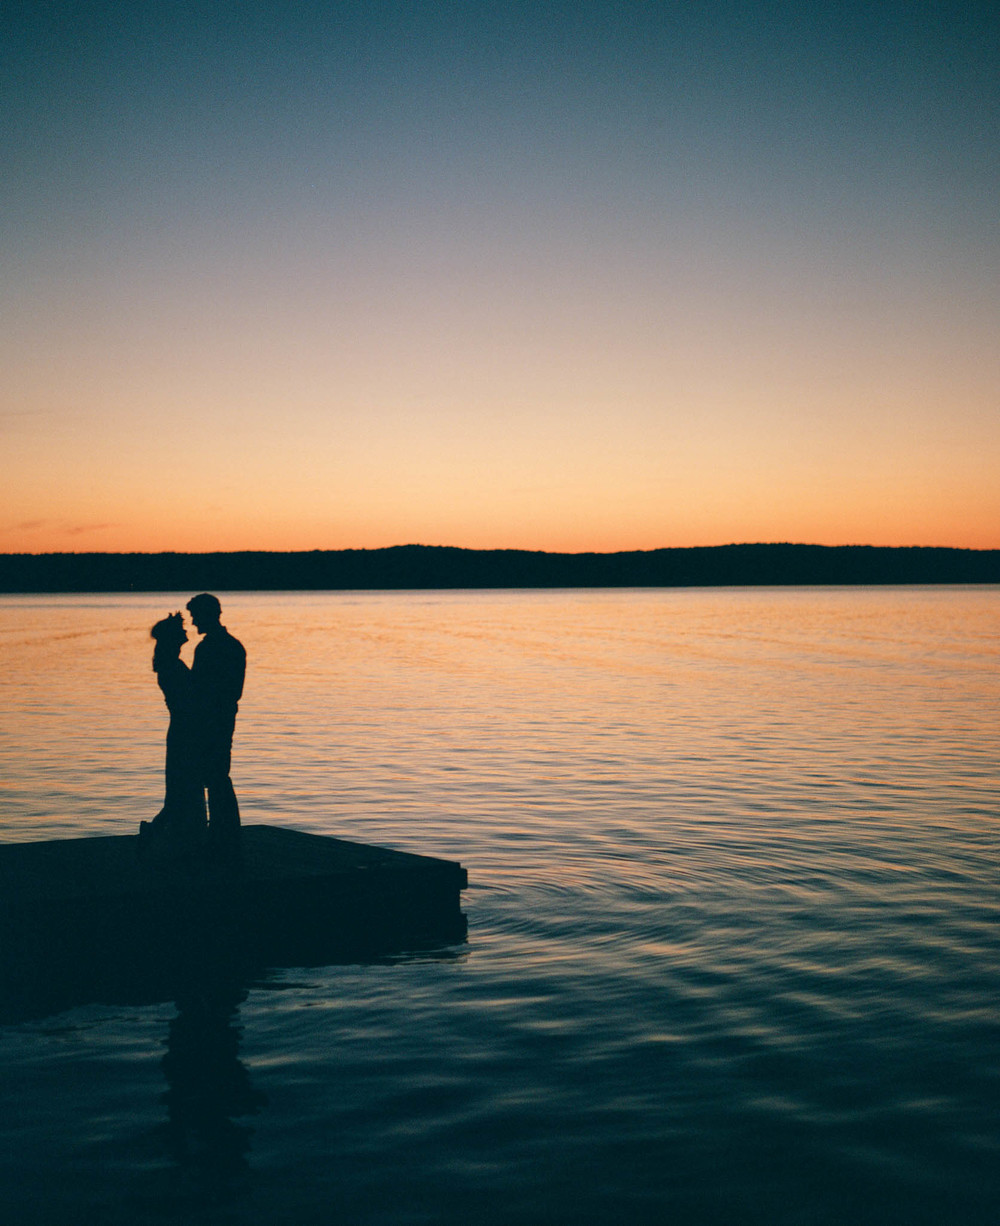 Couple at Sunset on Lake Jordan, Cary, NC